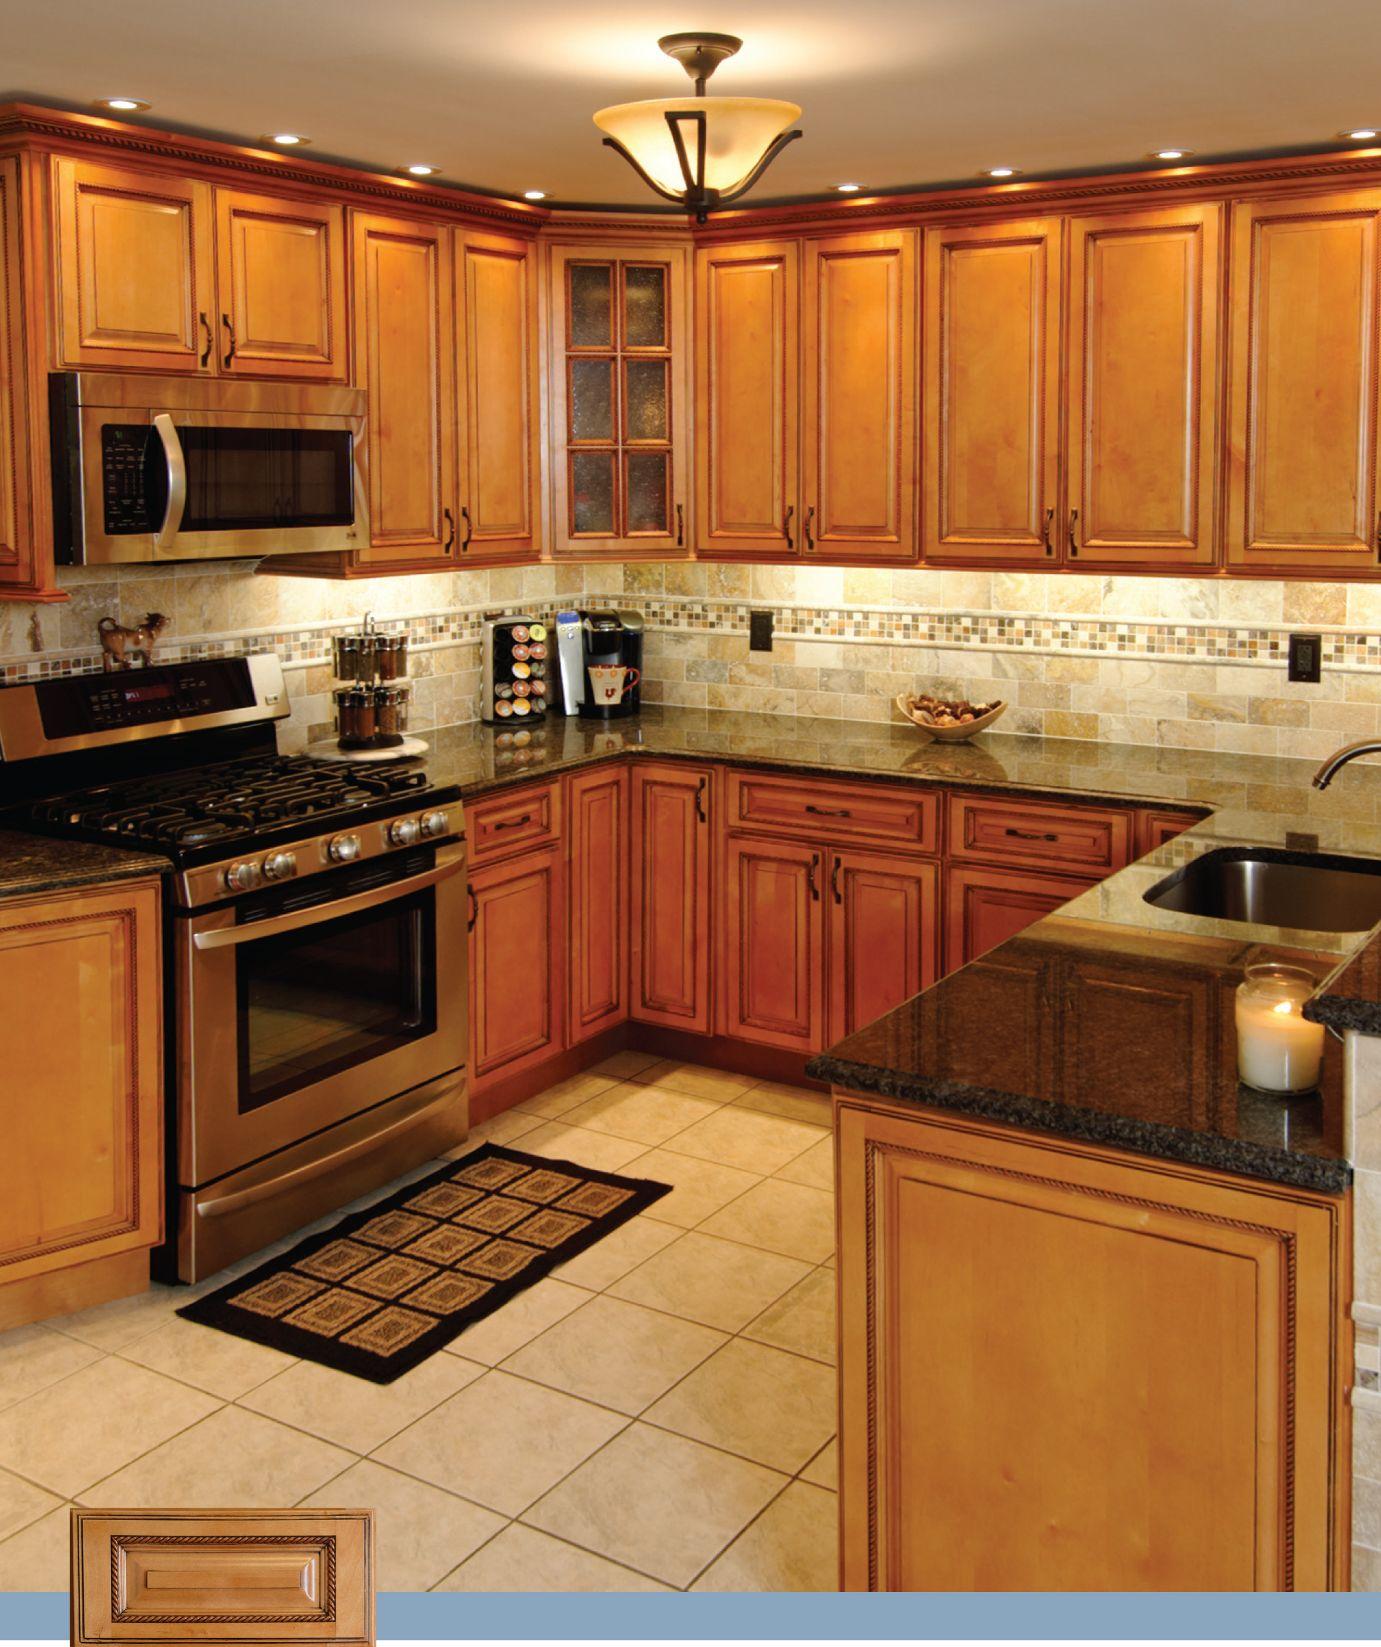 Kitchen cabinet pantry photo - 2